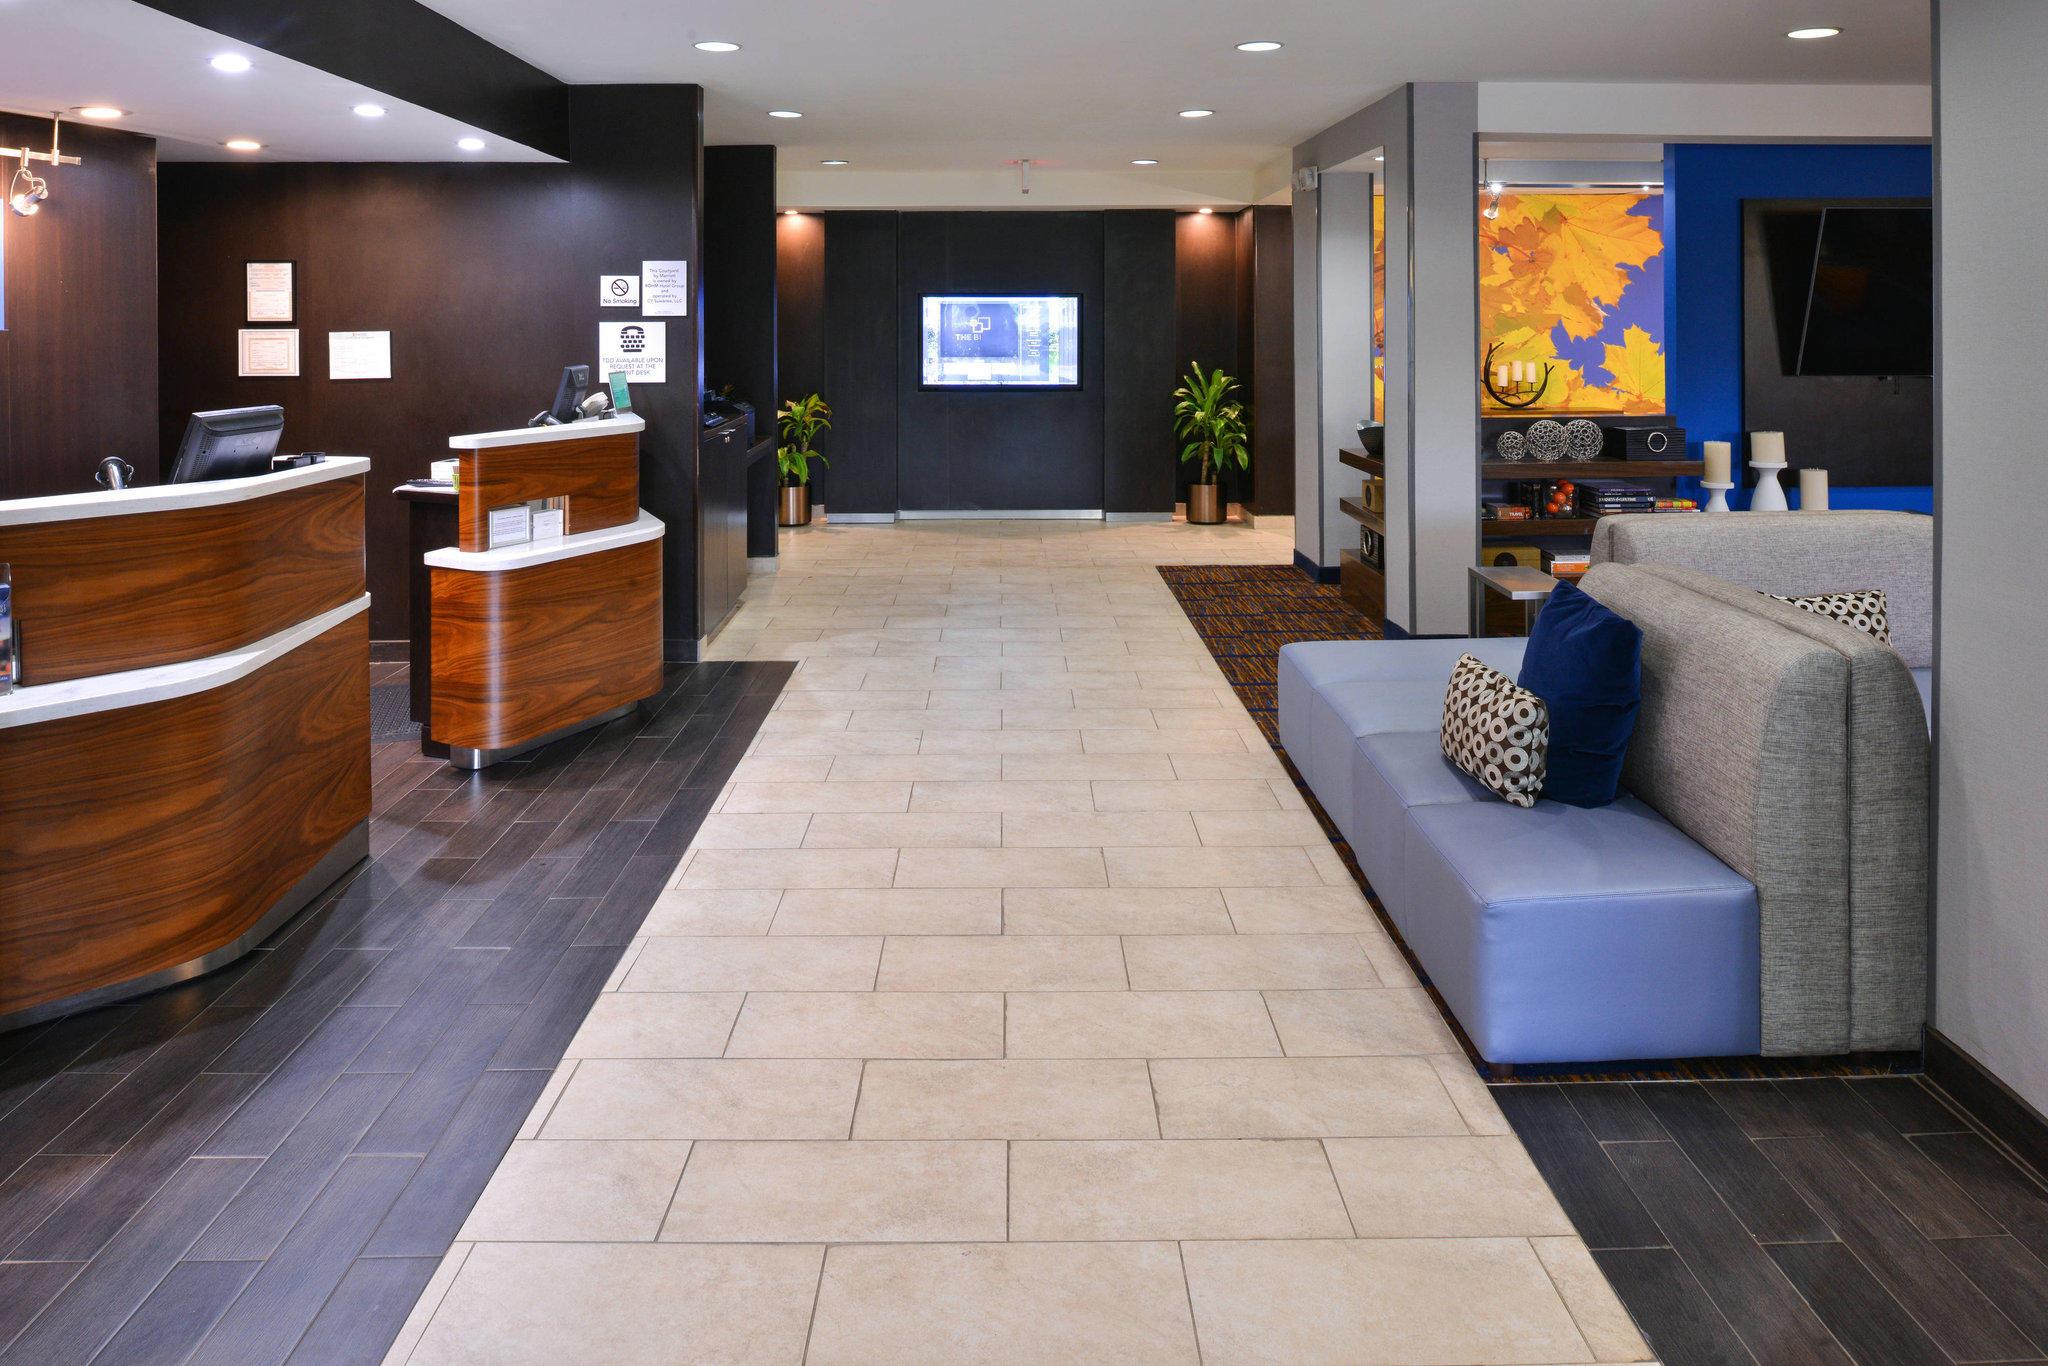 Courtyard by Marriott Atlanta Suwanee